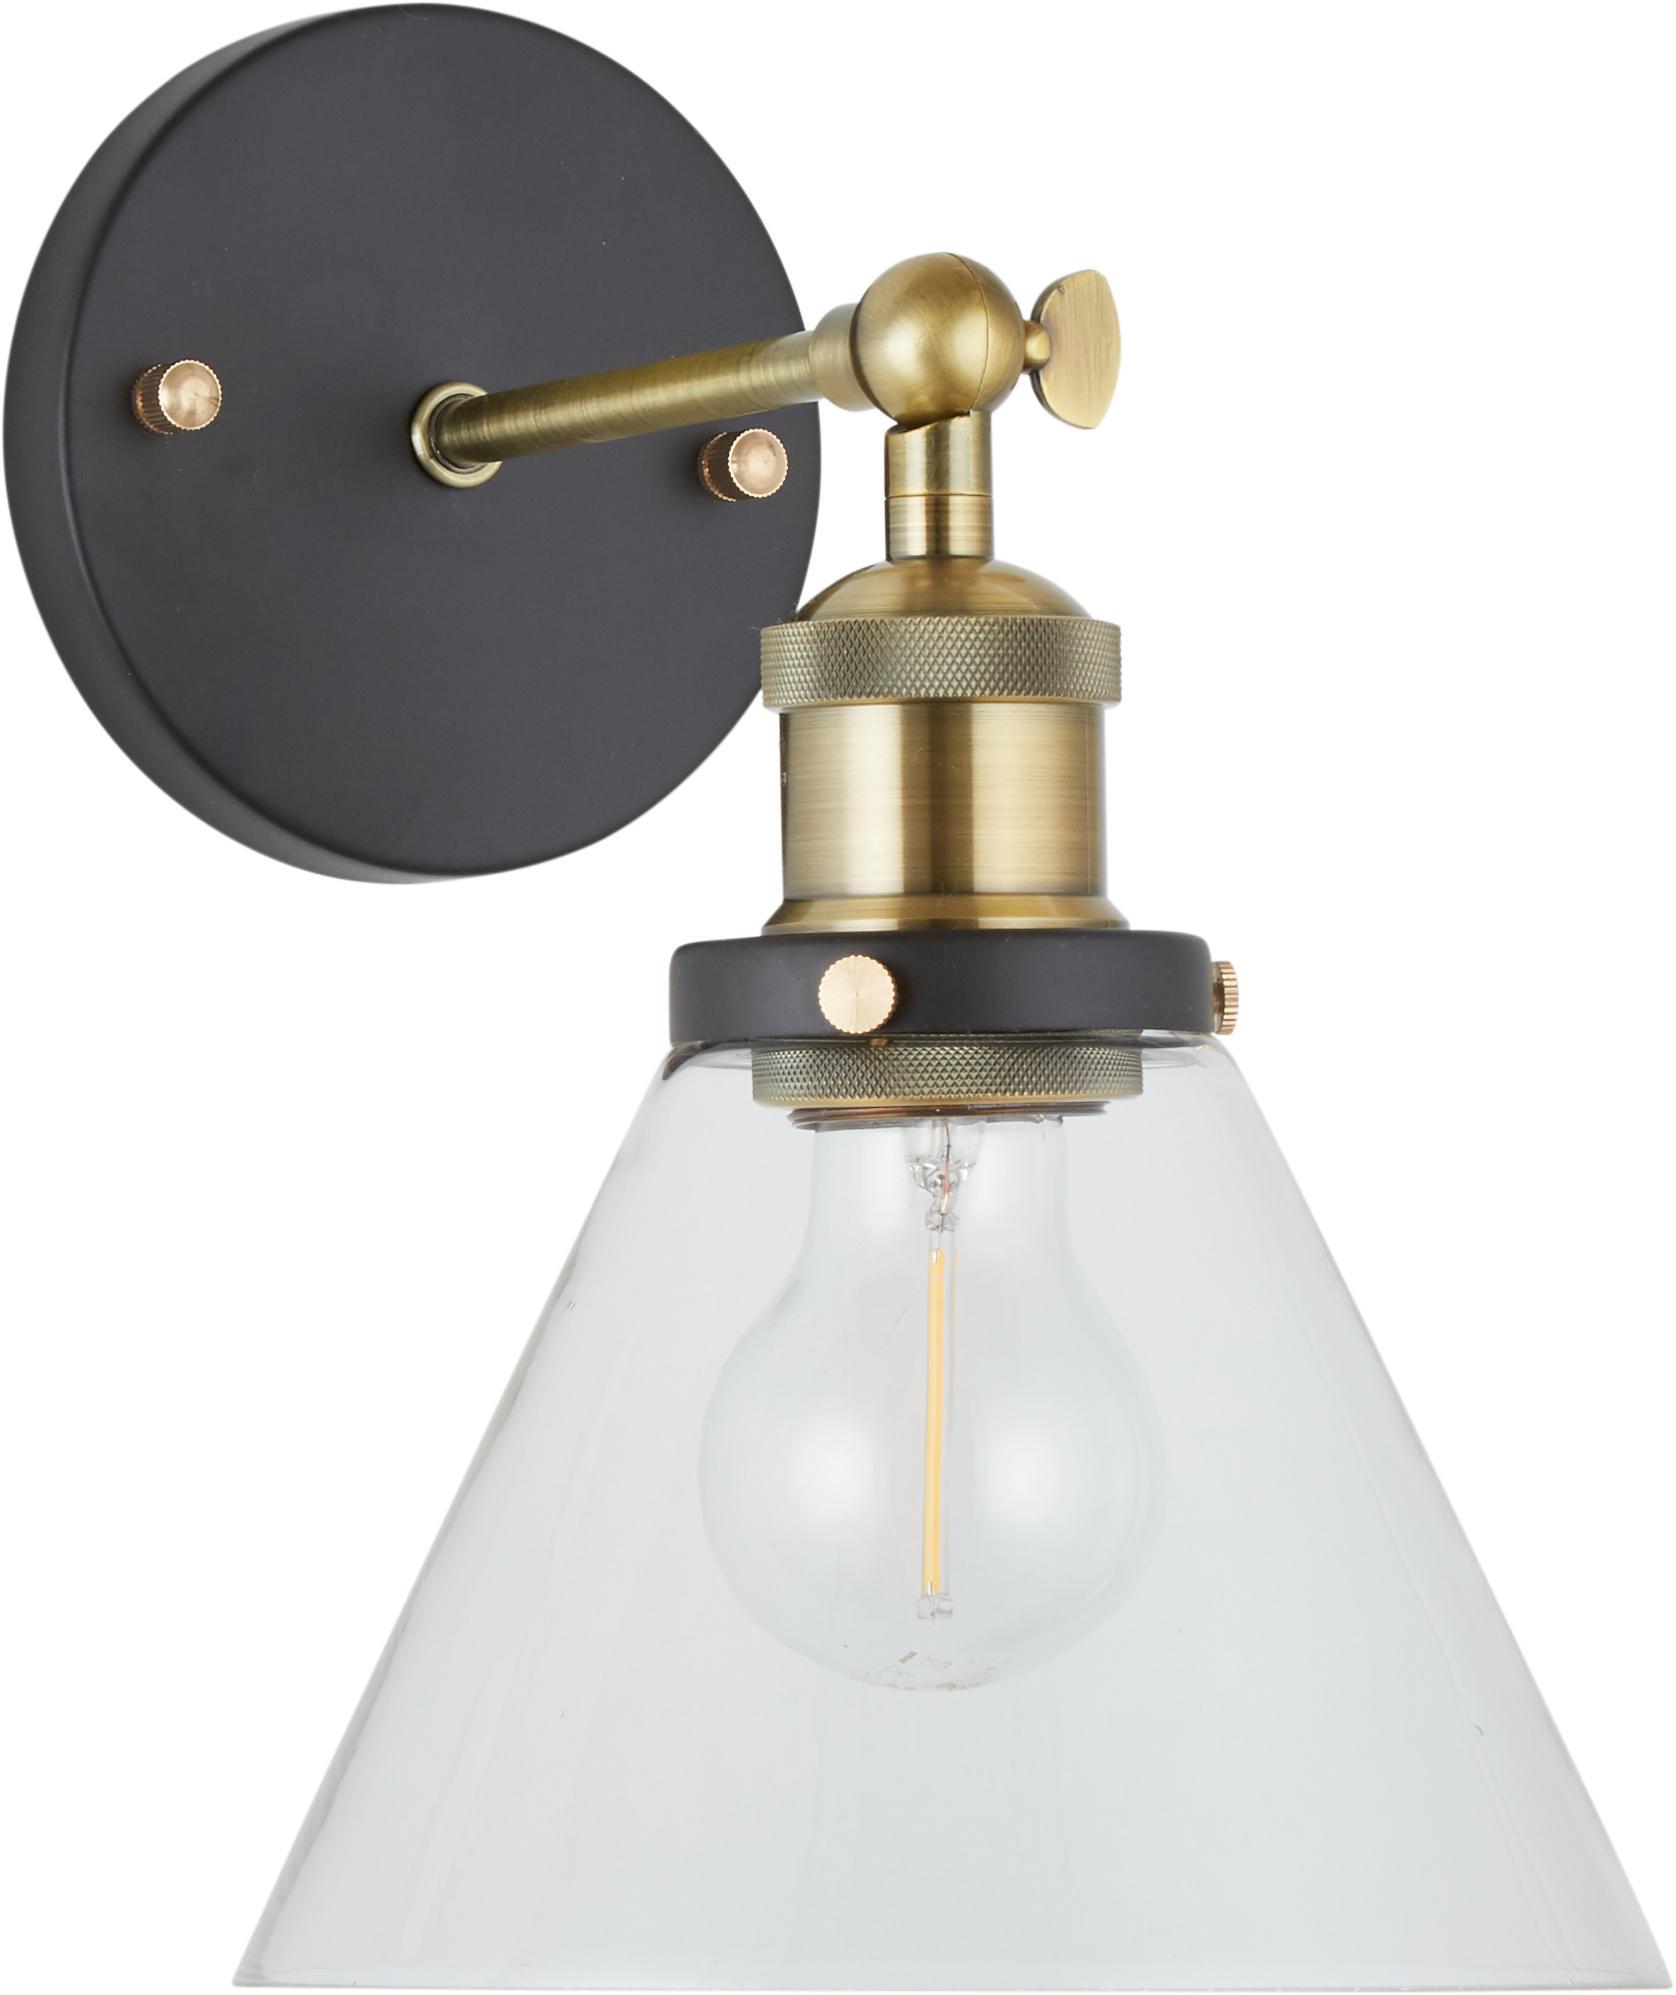 Aplique New York Loft No.1, Fijación: metal con pintura en polv, Pantalla: vidrio, Negro, latón, transparente, An 19 x Al 29 cm